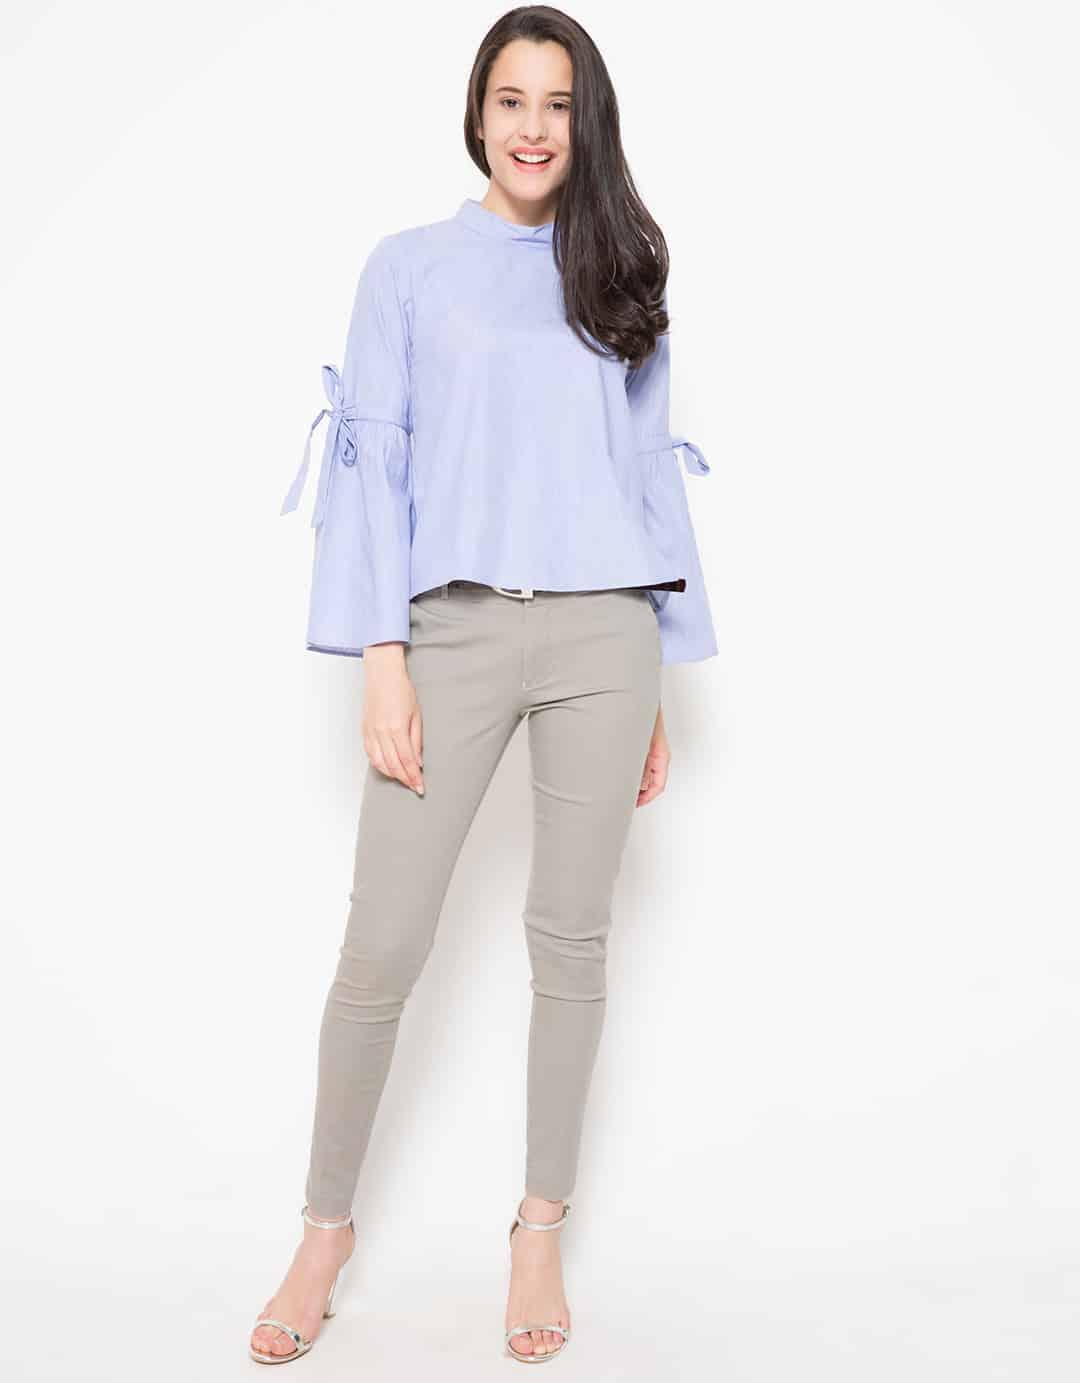 connexion-ribbon-sleeves-detailed-blouse-biru_3911037_4_29191 Bosan Baju Lebaran Warna Putih? Coba 11 Blouse Berwarna Pastel di Bawah 250 Ribu Ini!